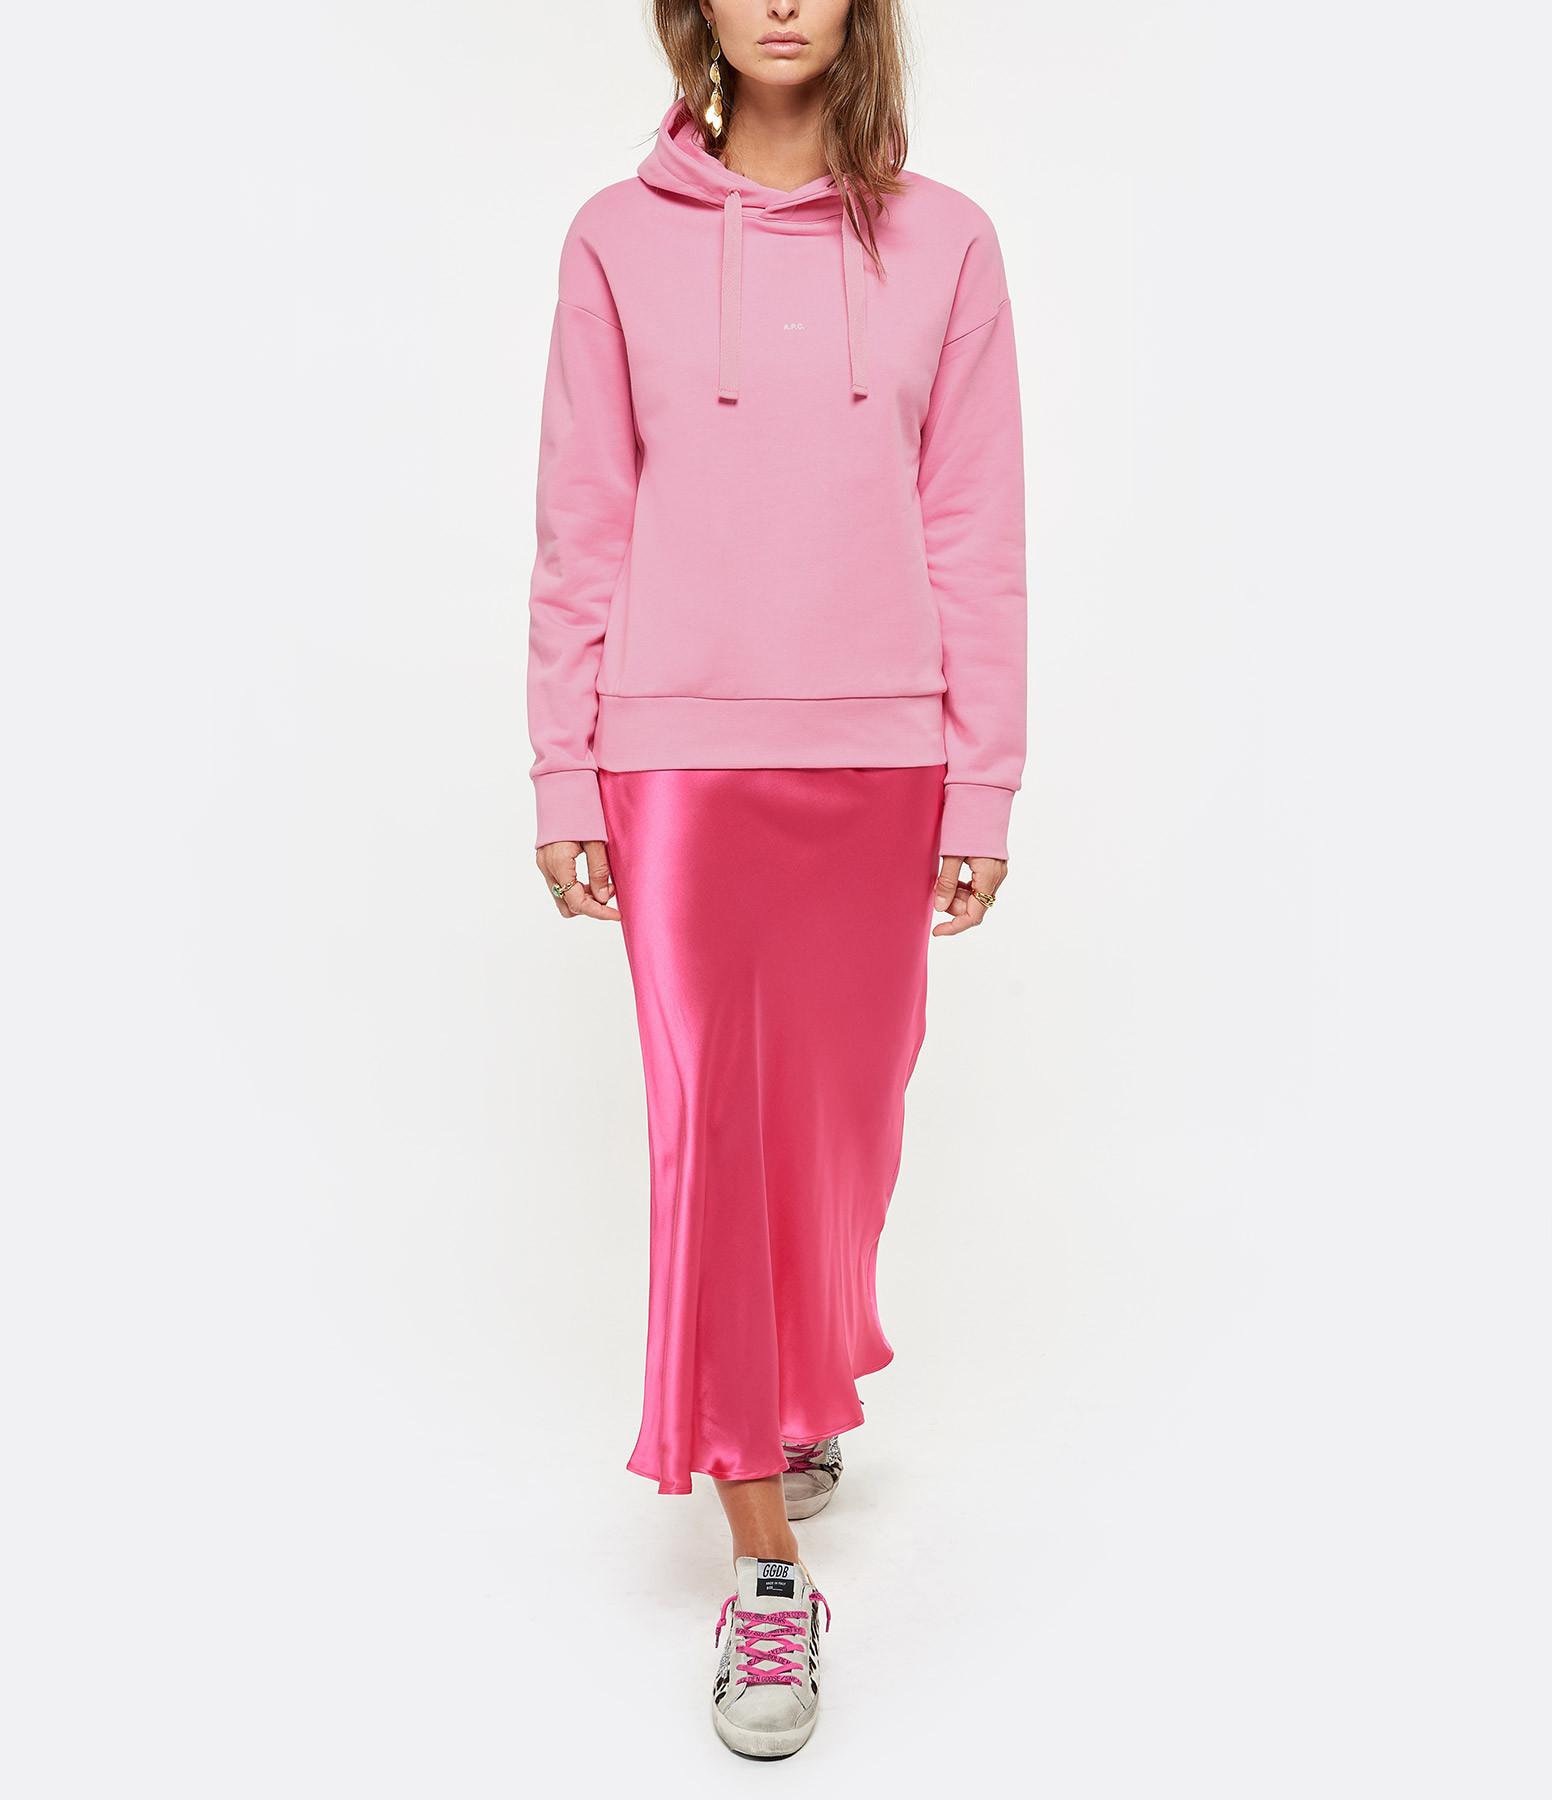 A.P.C. - Sweatshirt Christina Rose